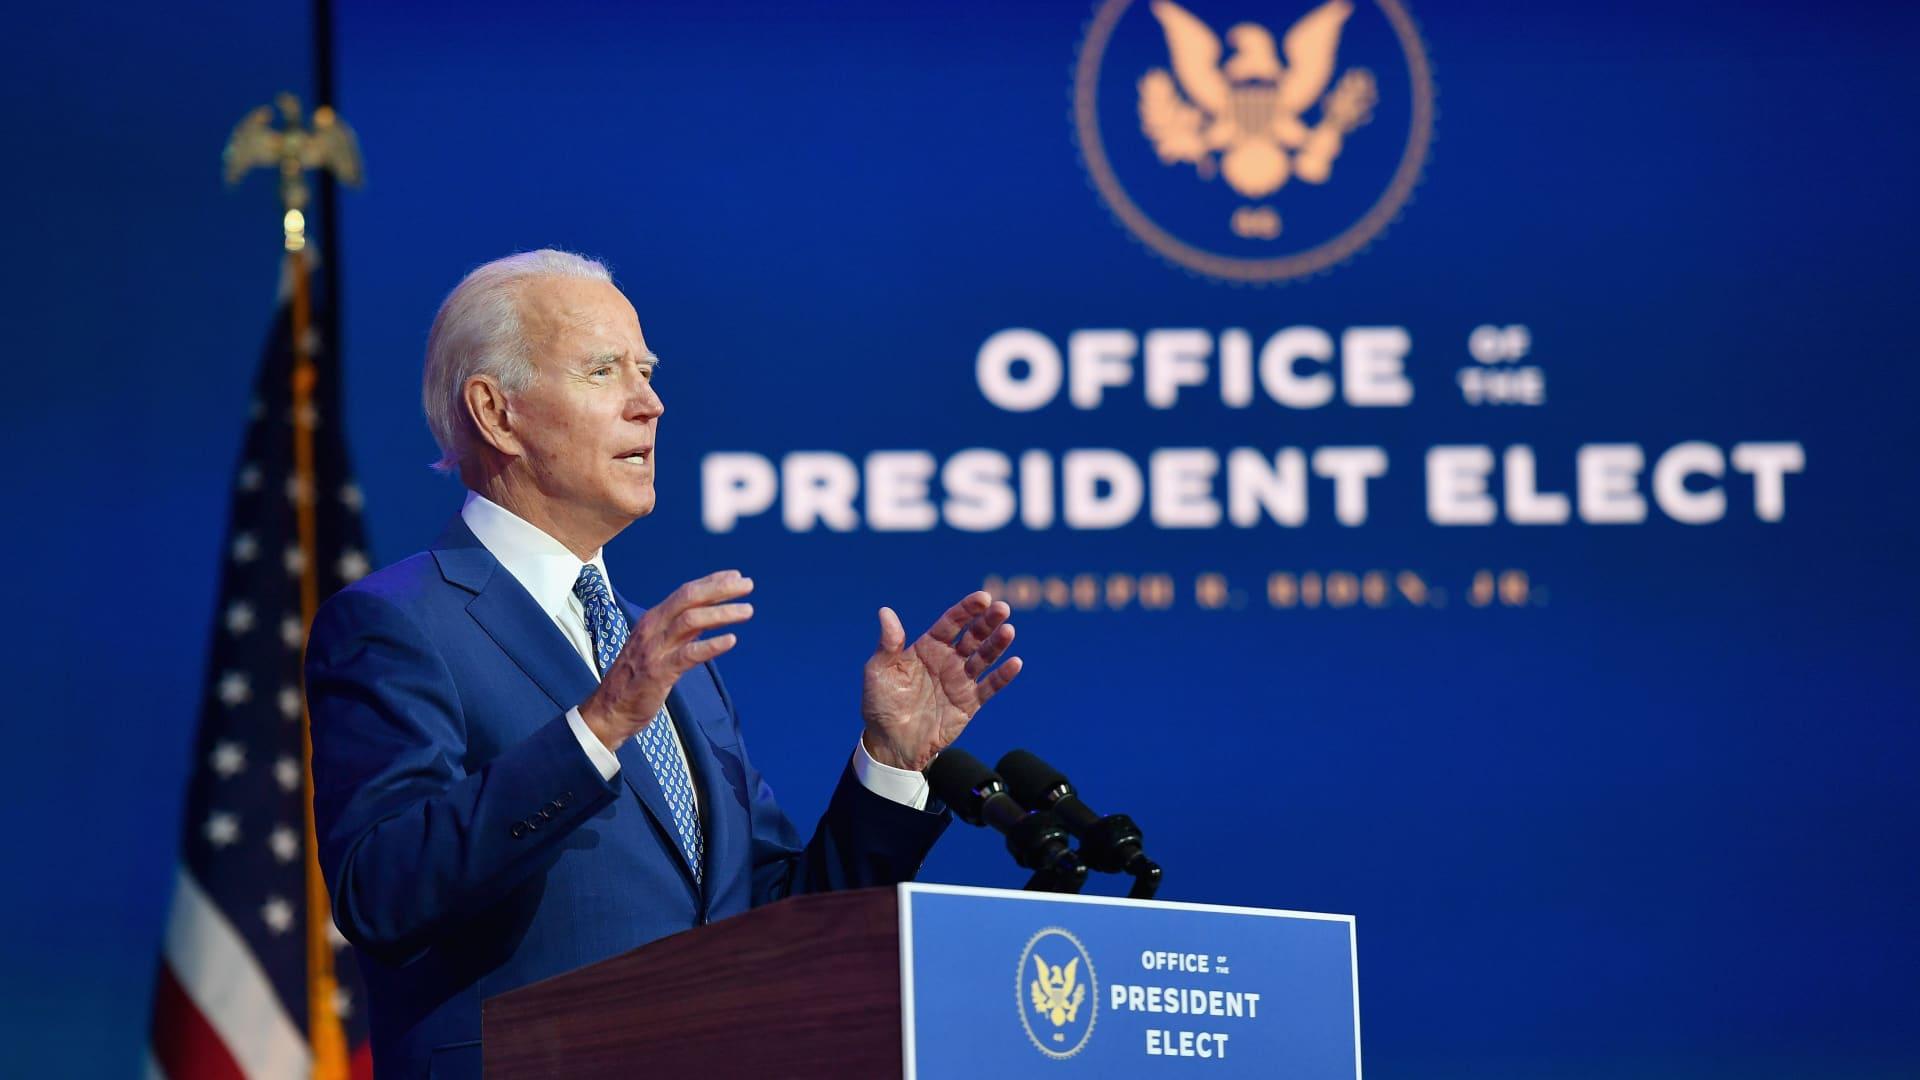 President-elect Joe Biden delivers remarks in Wilmington, Delaware, on Nov. 9, 2020.